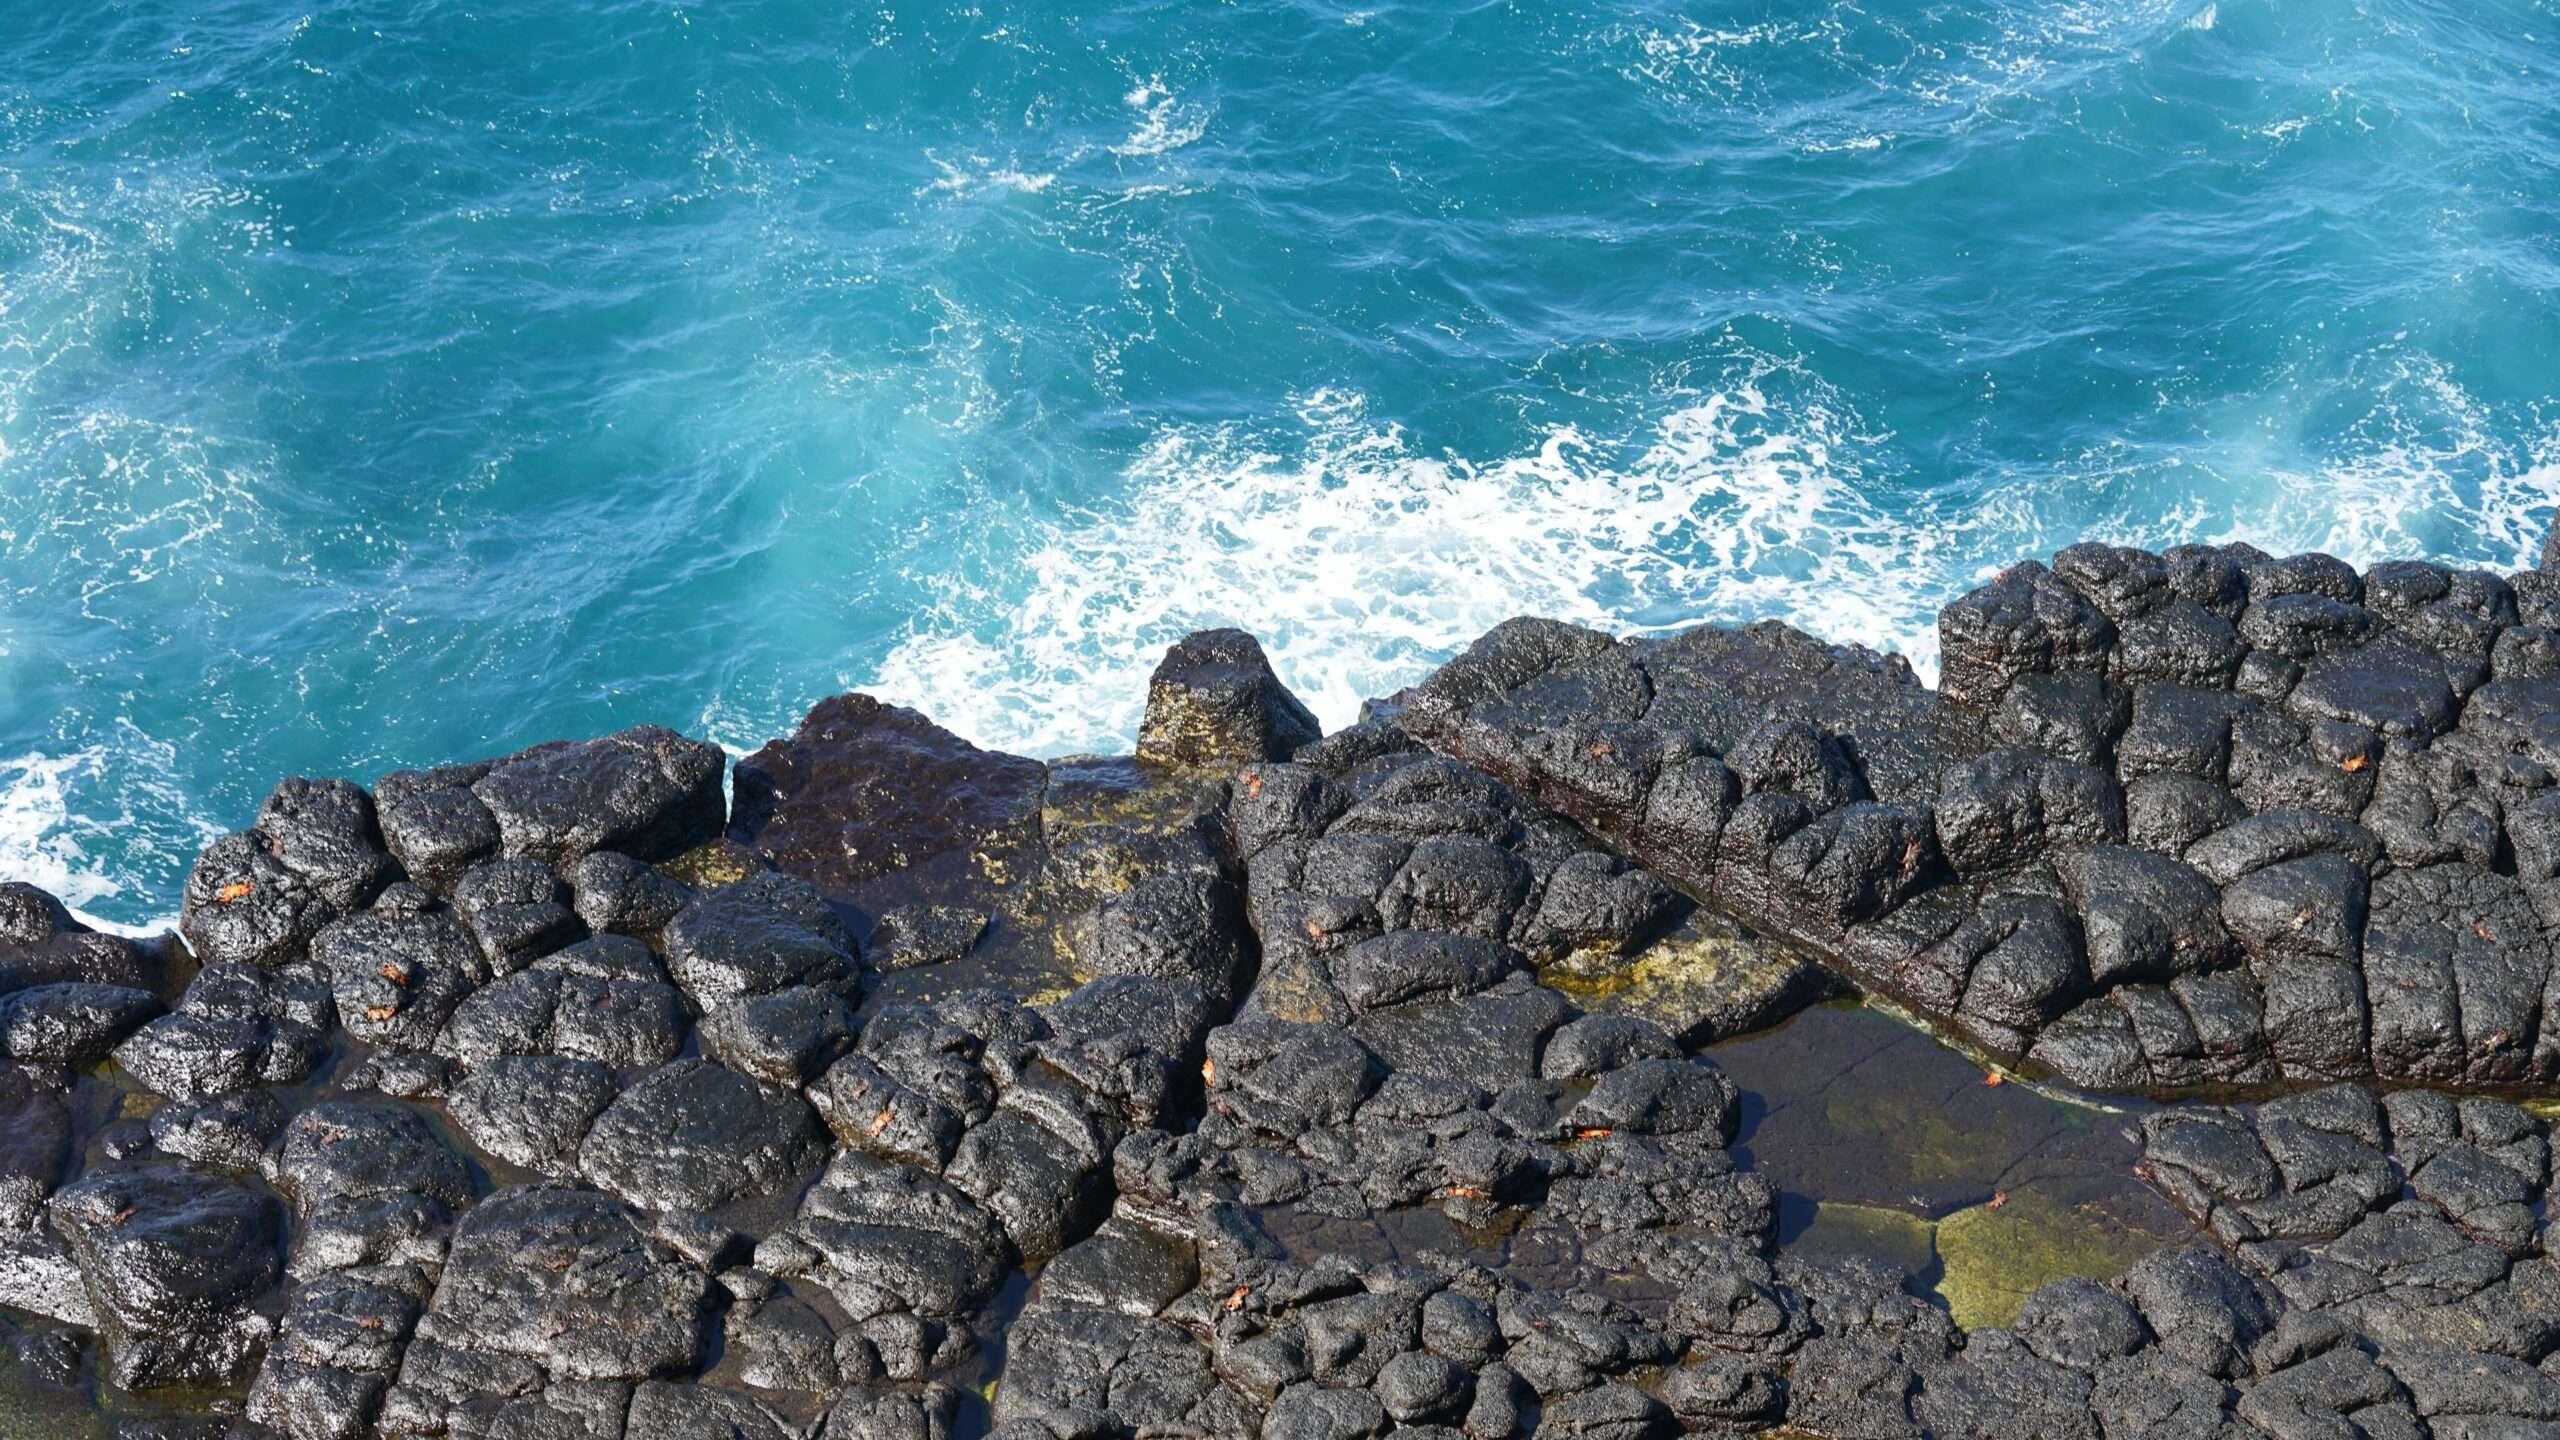 waves crash against the rocks in Galápagos islands